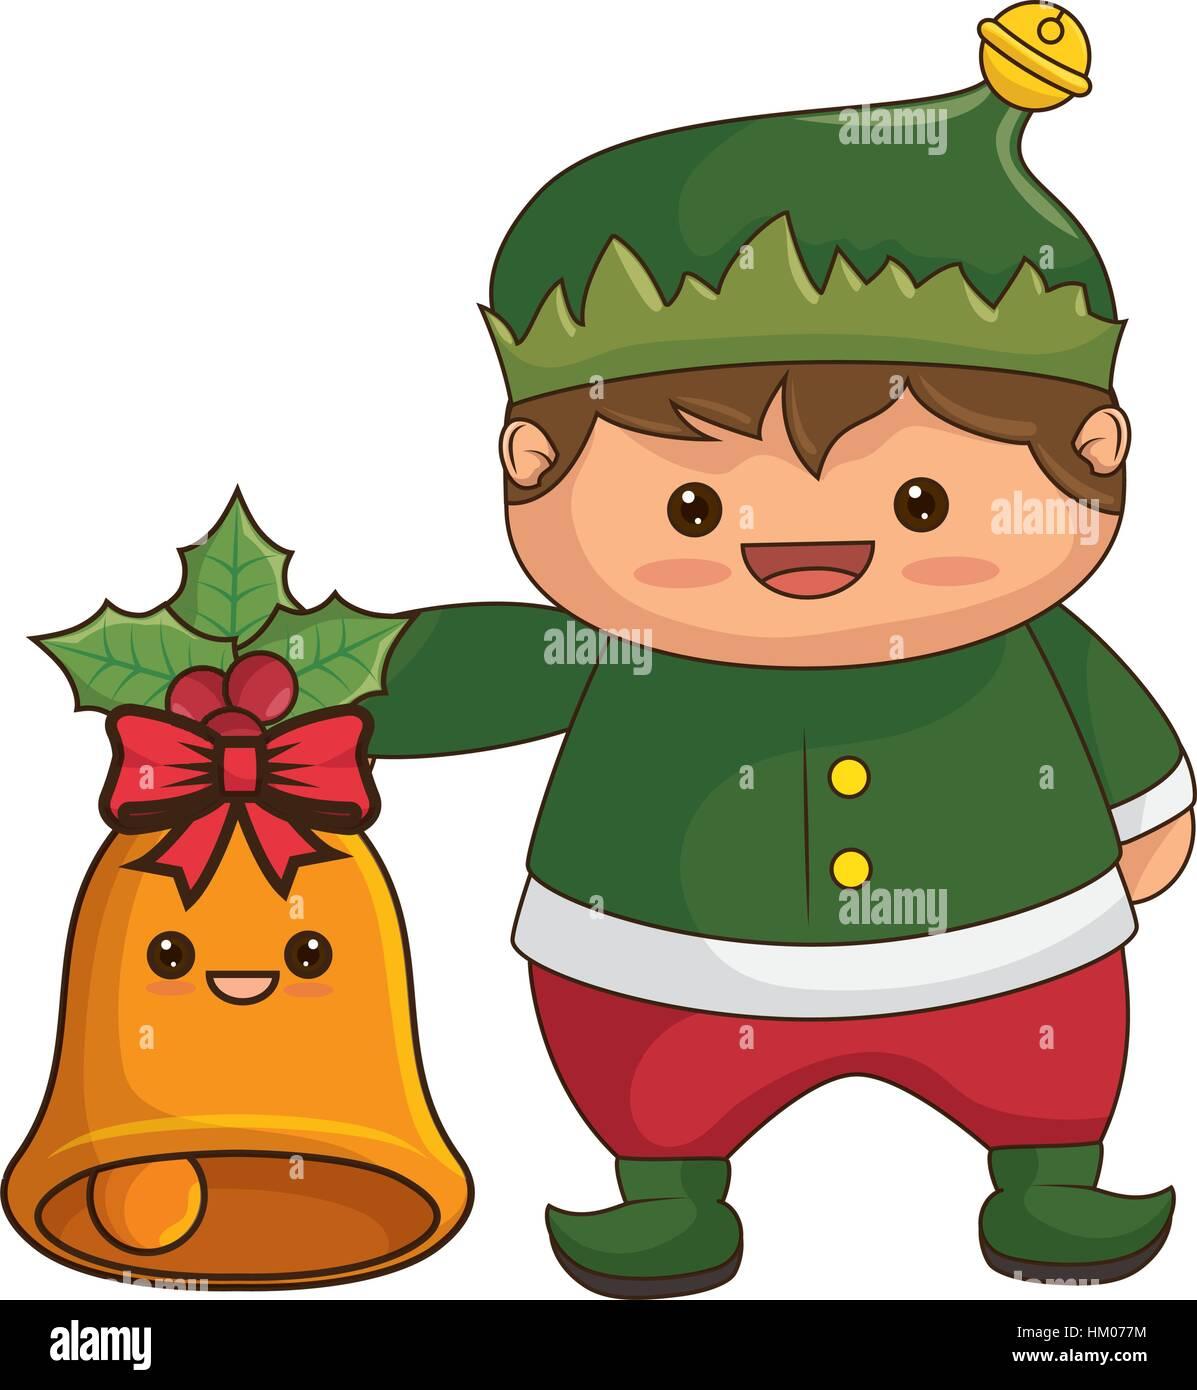 happy merry christmas elf kawaii character vector illustration design stock image - Merry Christmas Elf